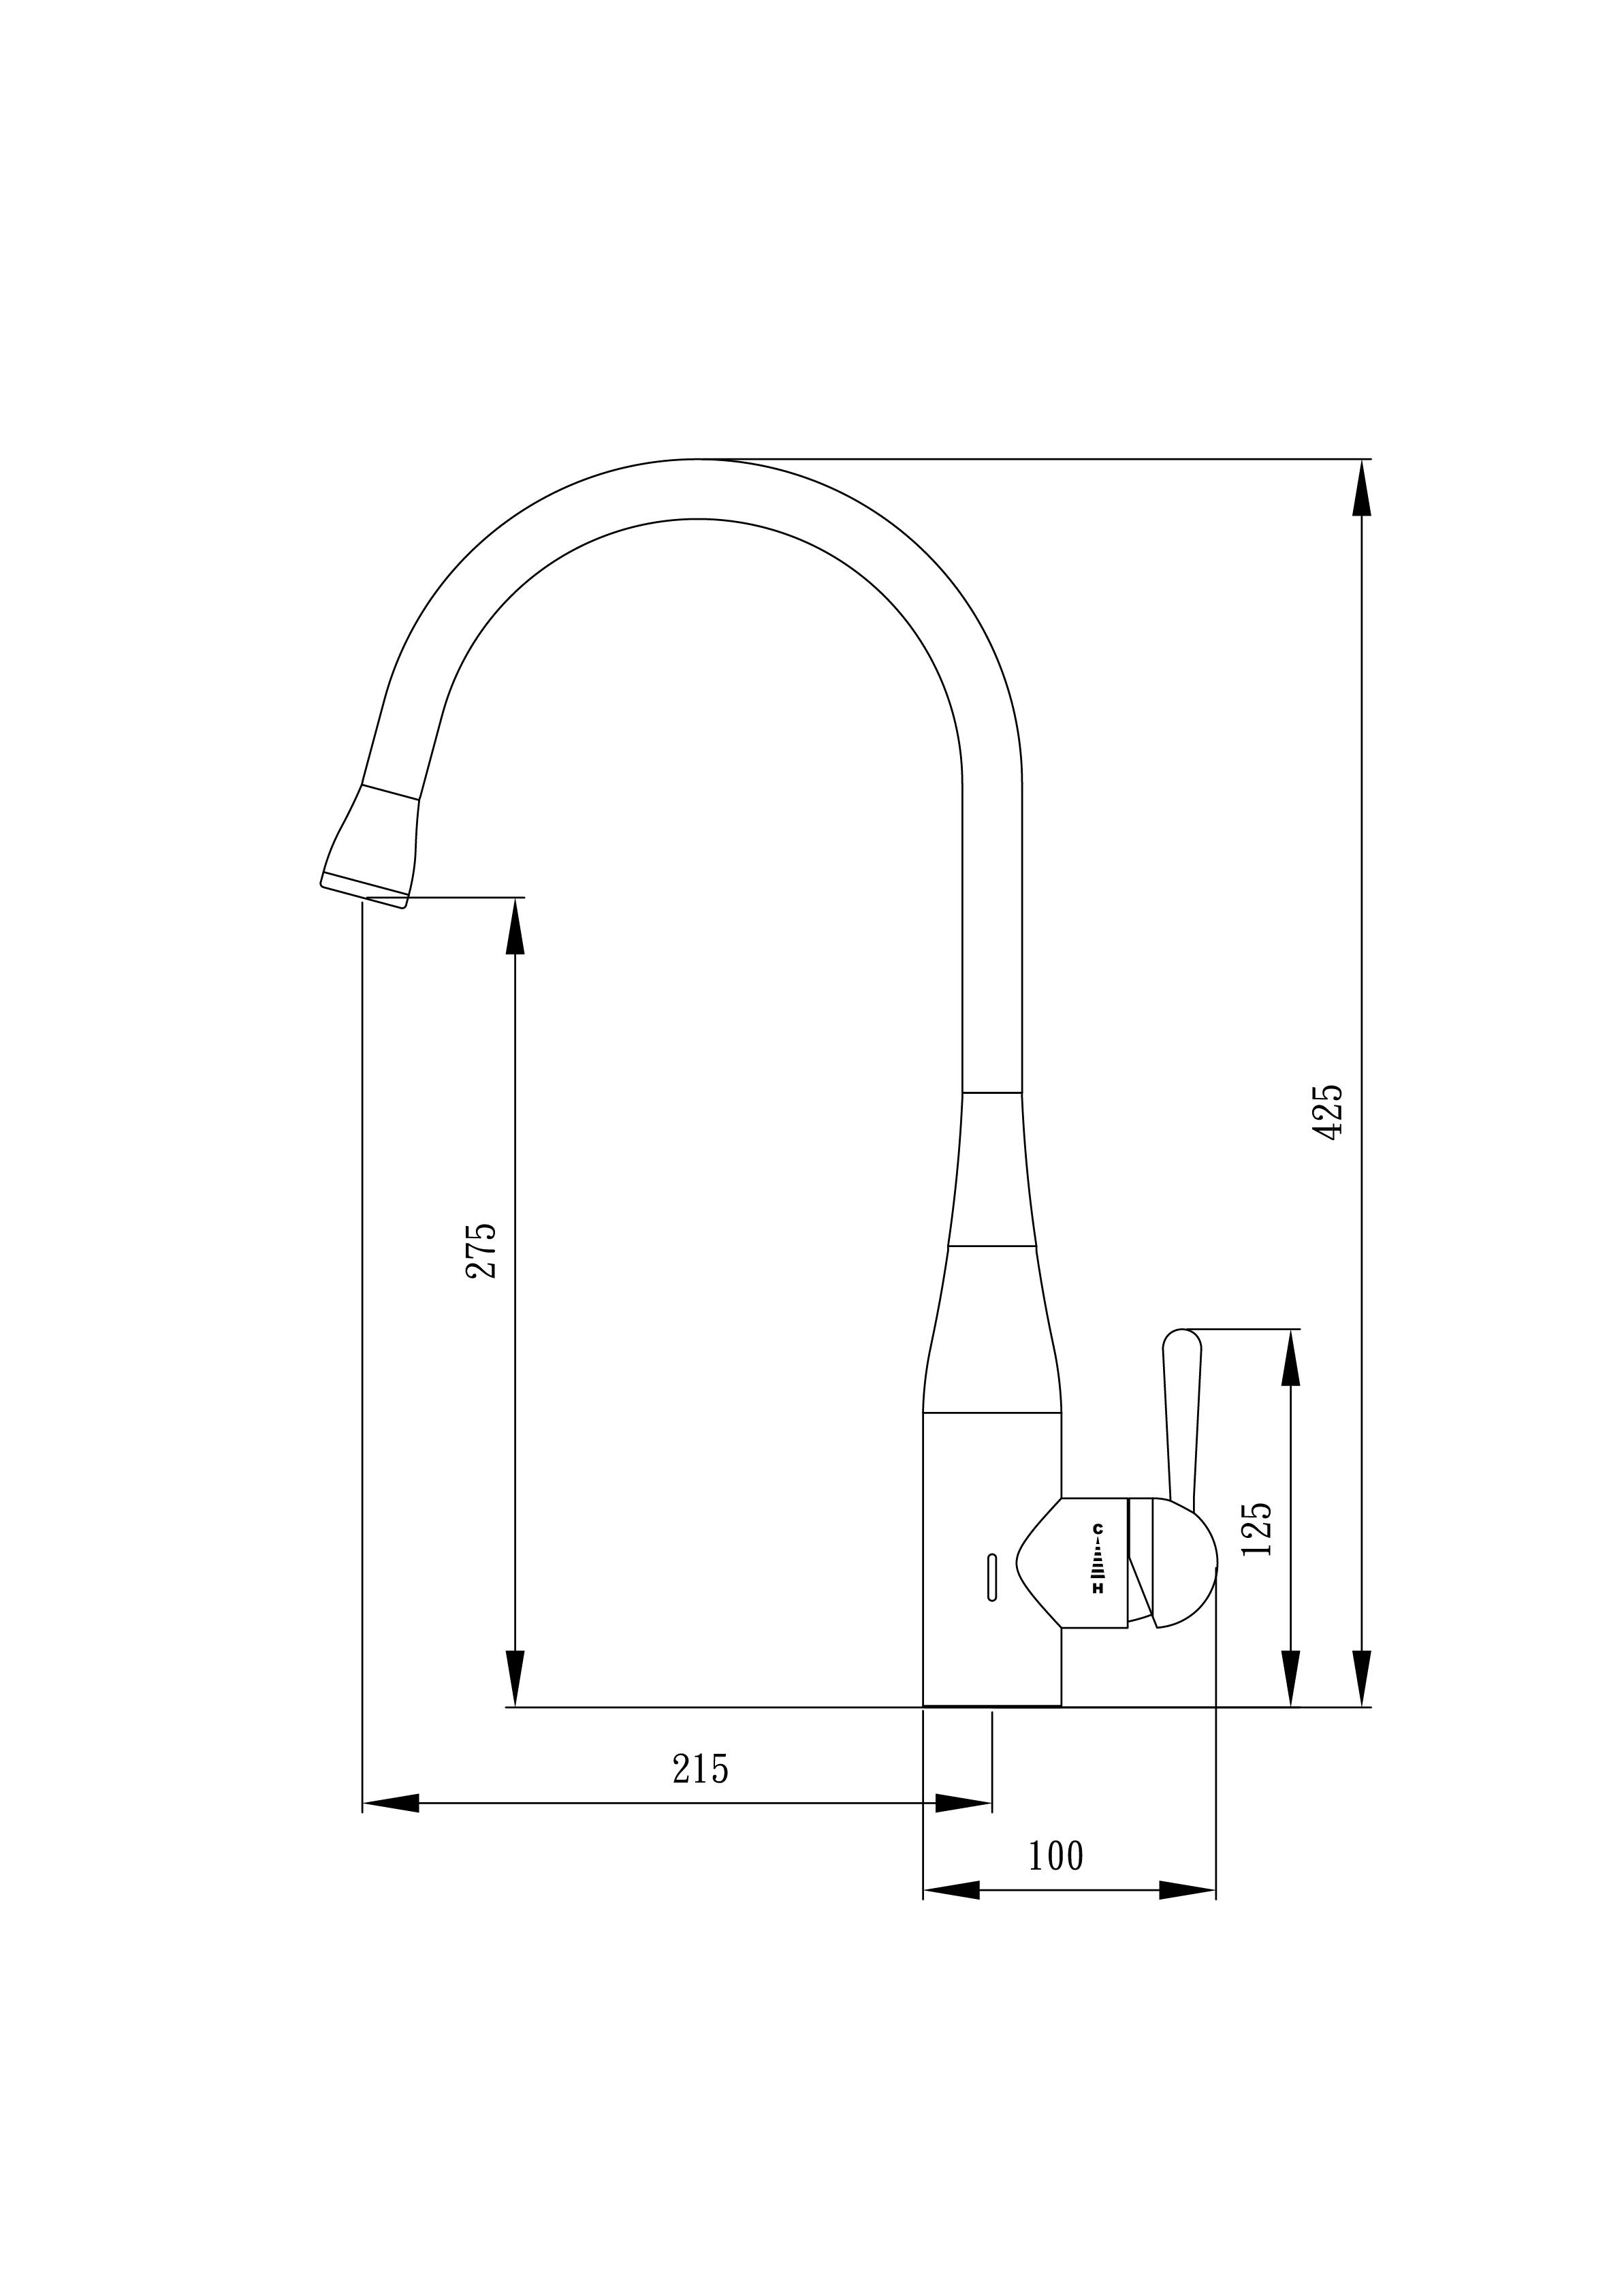 Aqualogic Ozone Kitchen Mixer